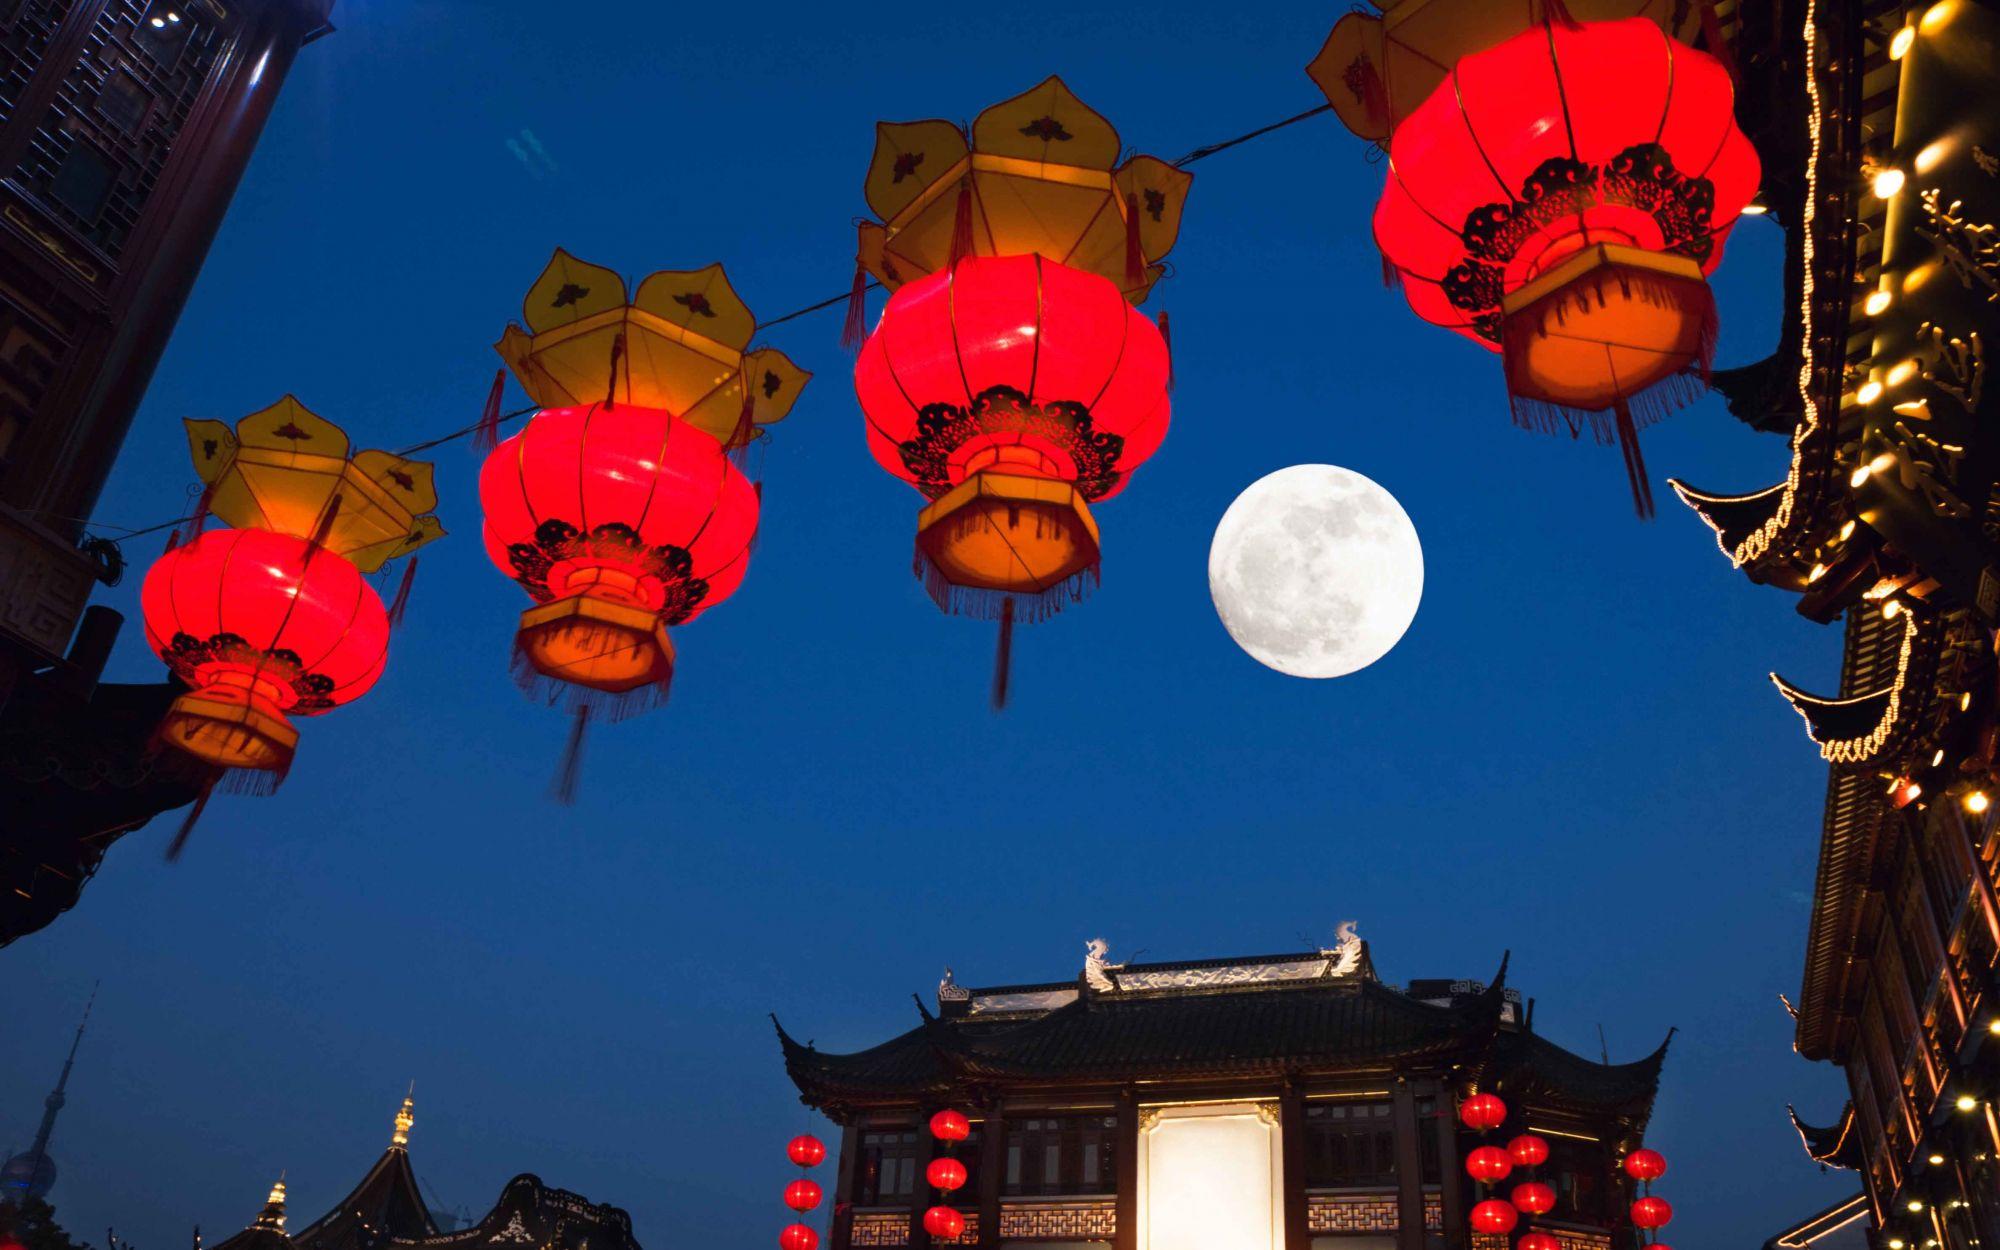 shanghai Yu yuan gardens at night,mid-autumn,